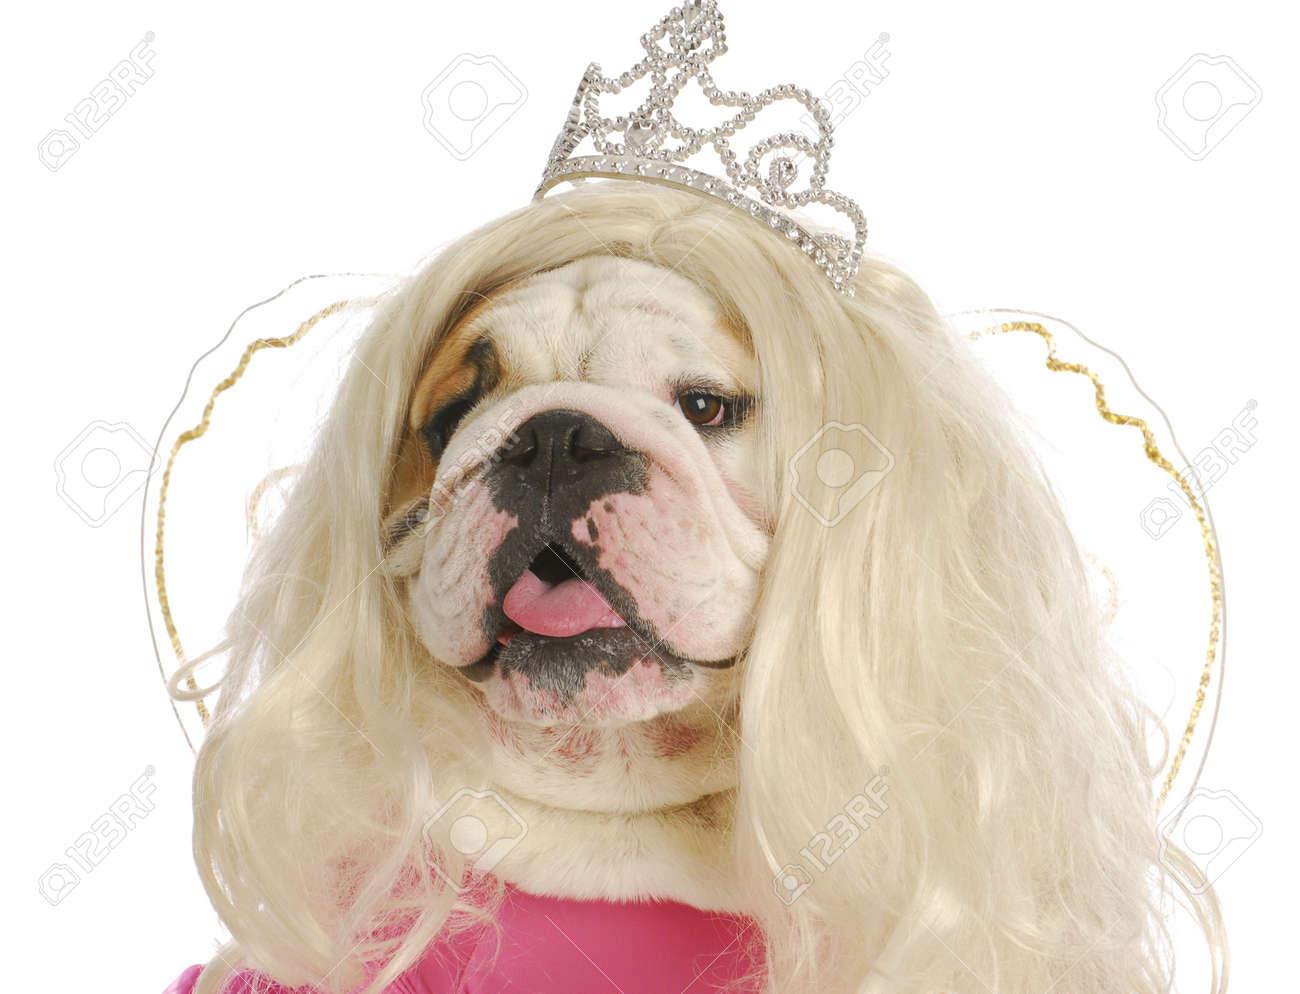 ugly princess - english bulldog wearing wig and princess costume on white background Stock Photo - 10815069